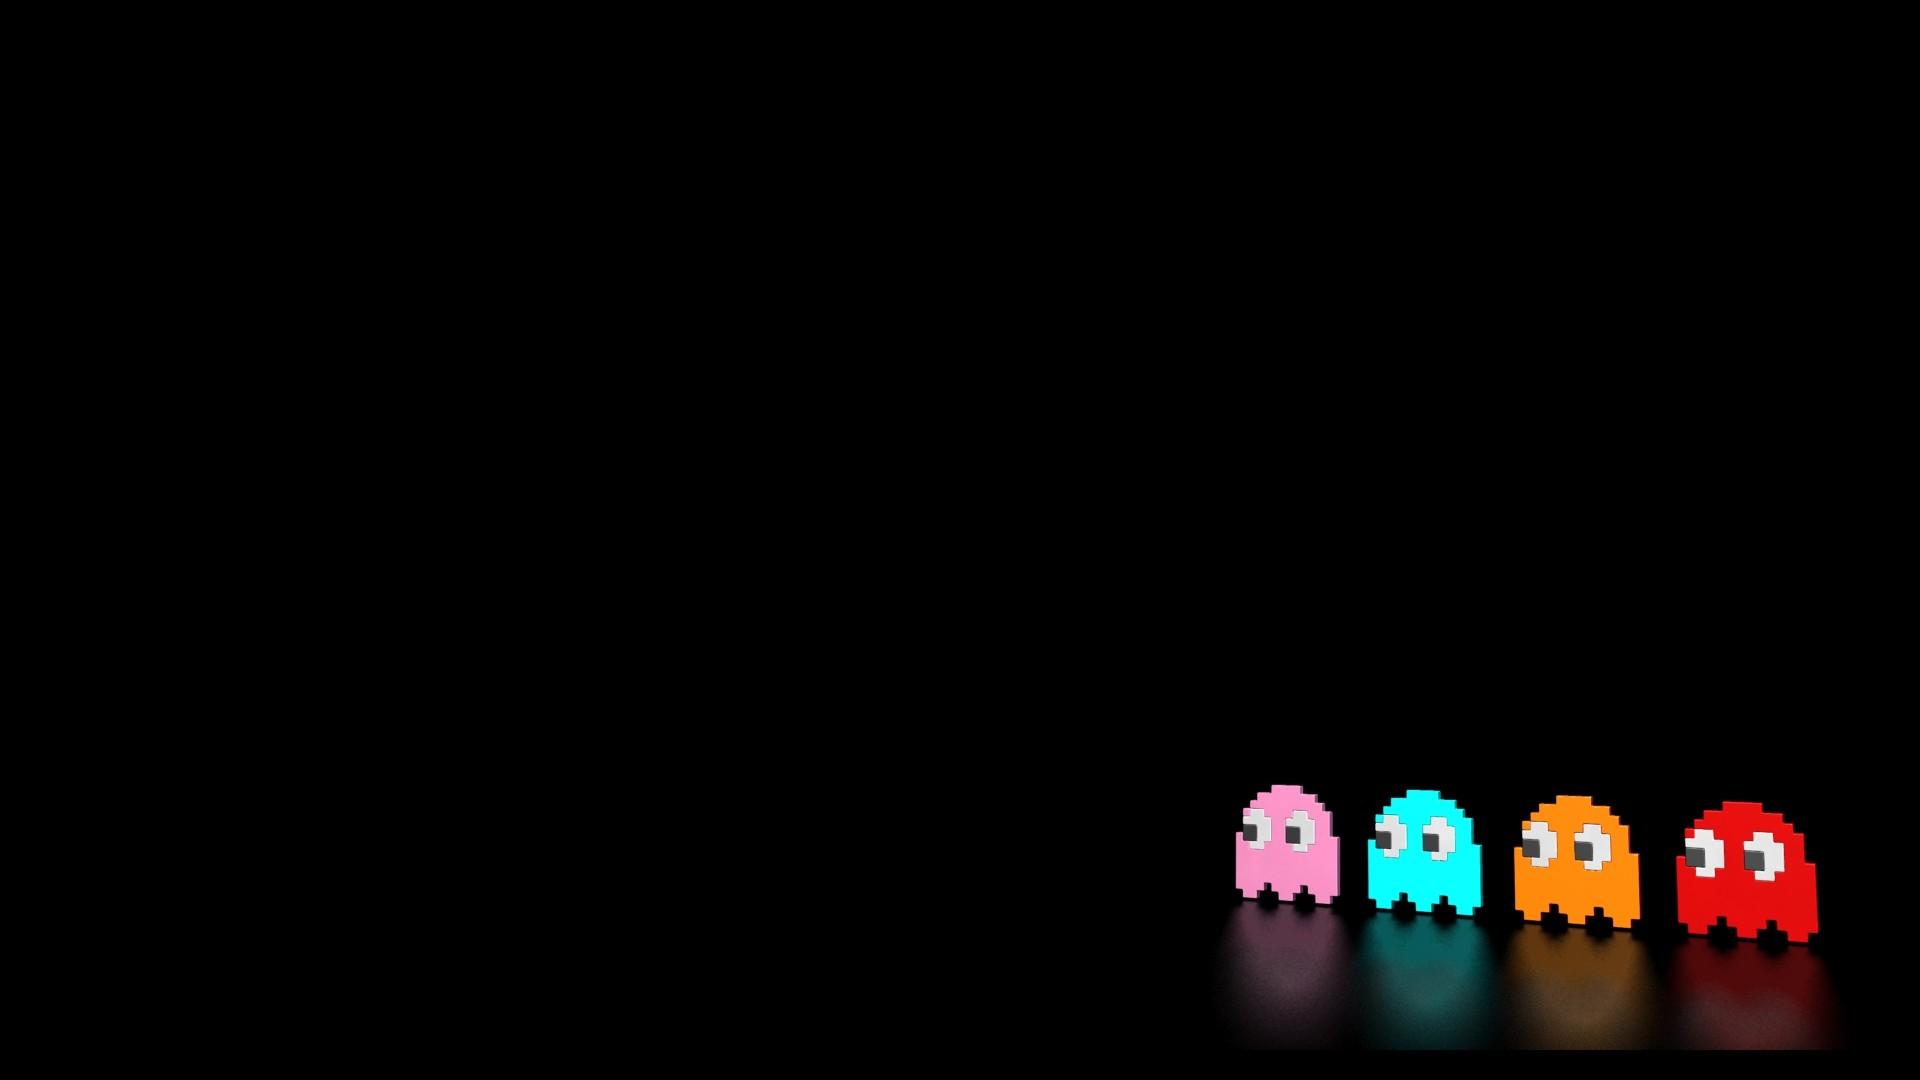 Free 8bit Pacman Wallpapers, Free 8bit Pacman HD Wallpapers, 8bit .